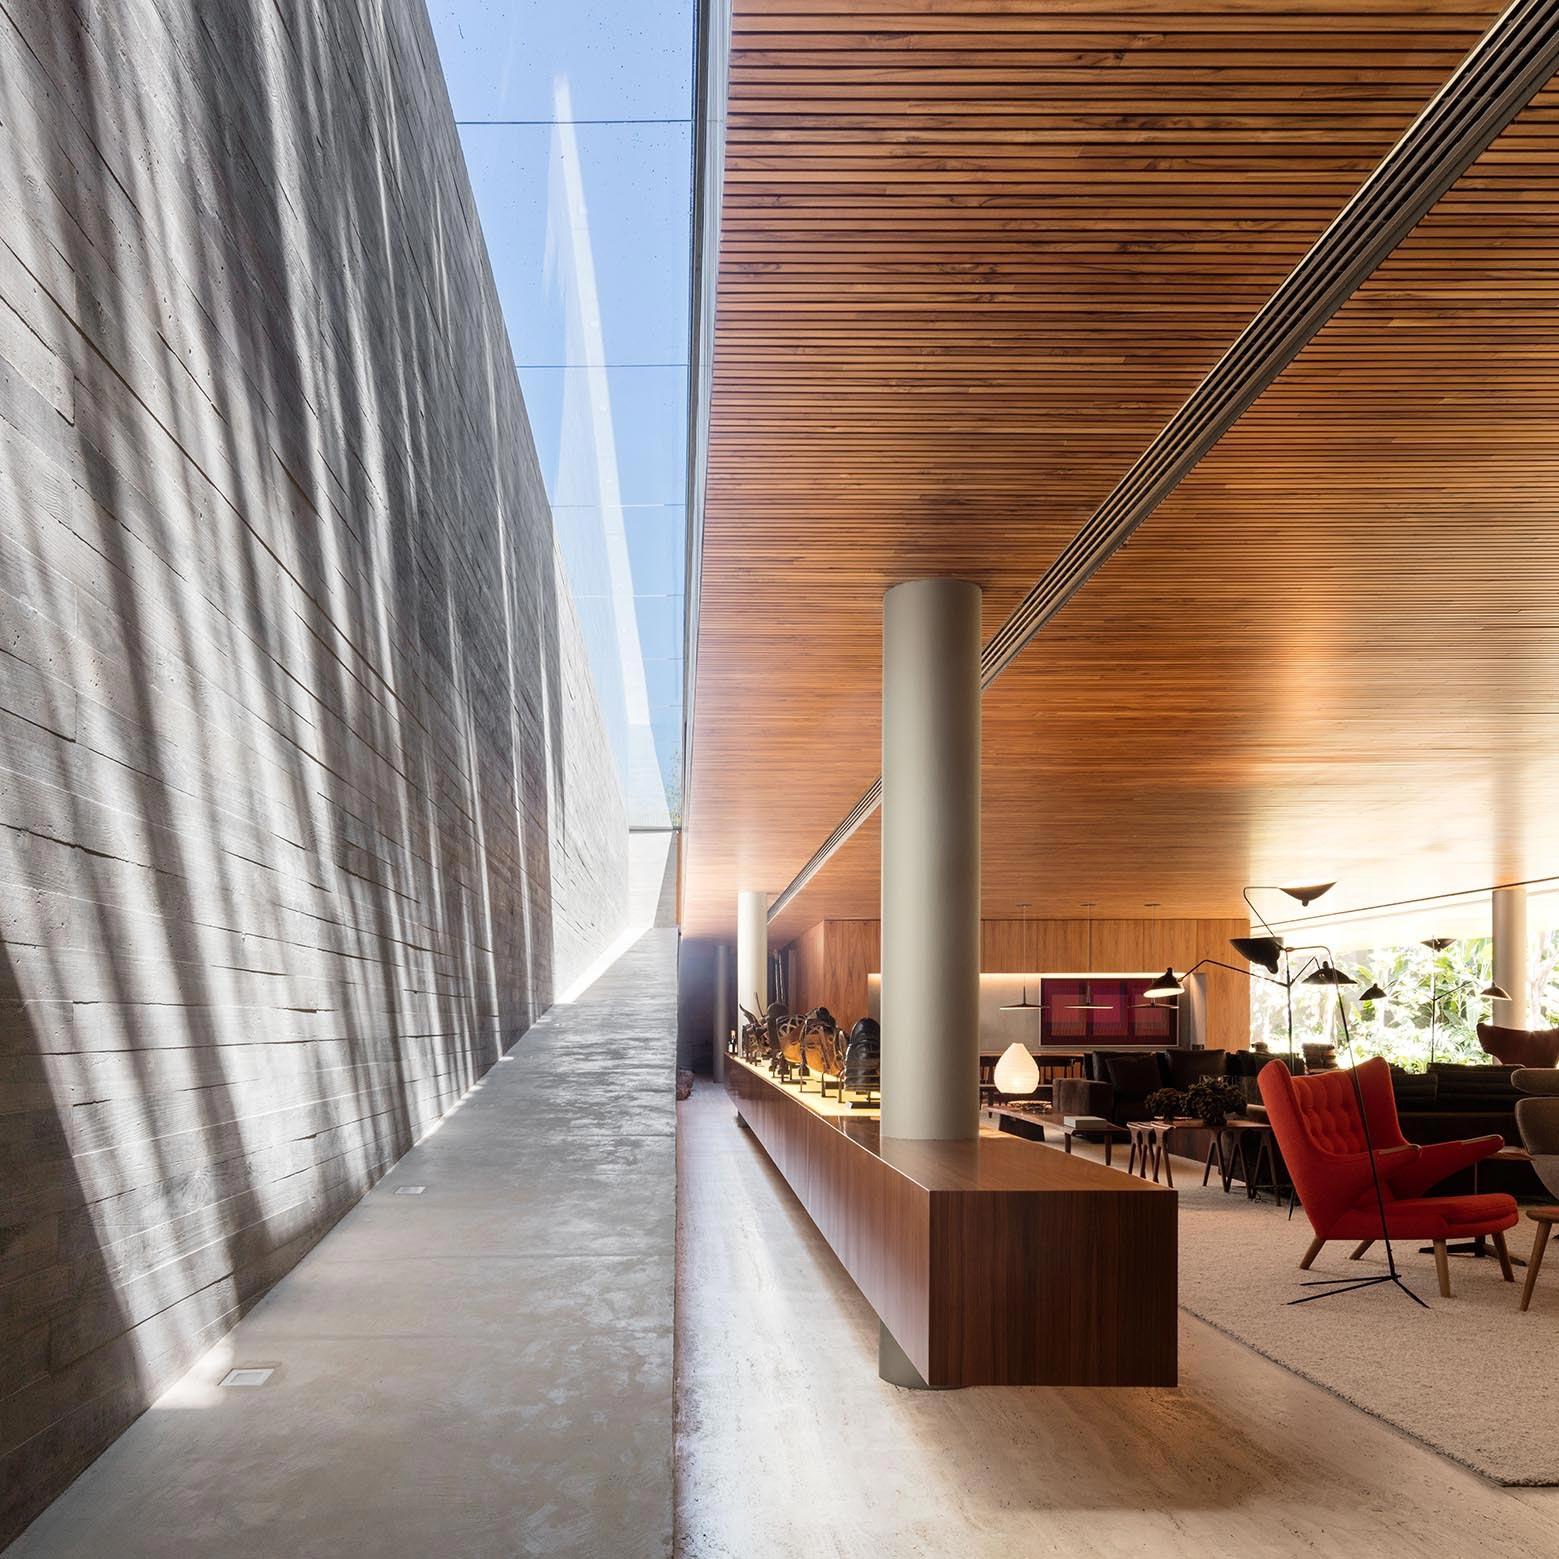 Ramp House by Studio mk27 - Marcio Kogan + Renata Furlanetto - CAANdesign | Architecture and home design blog